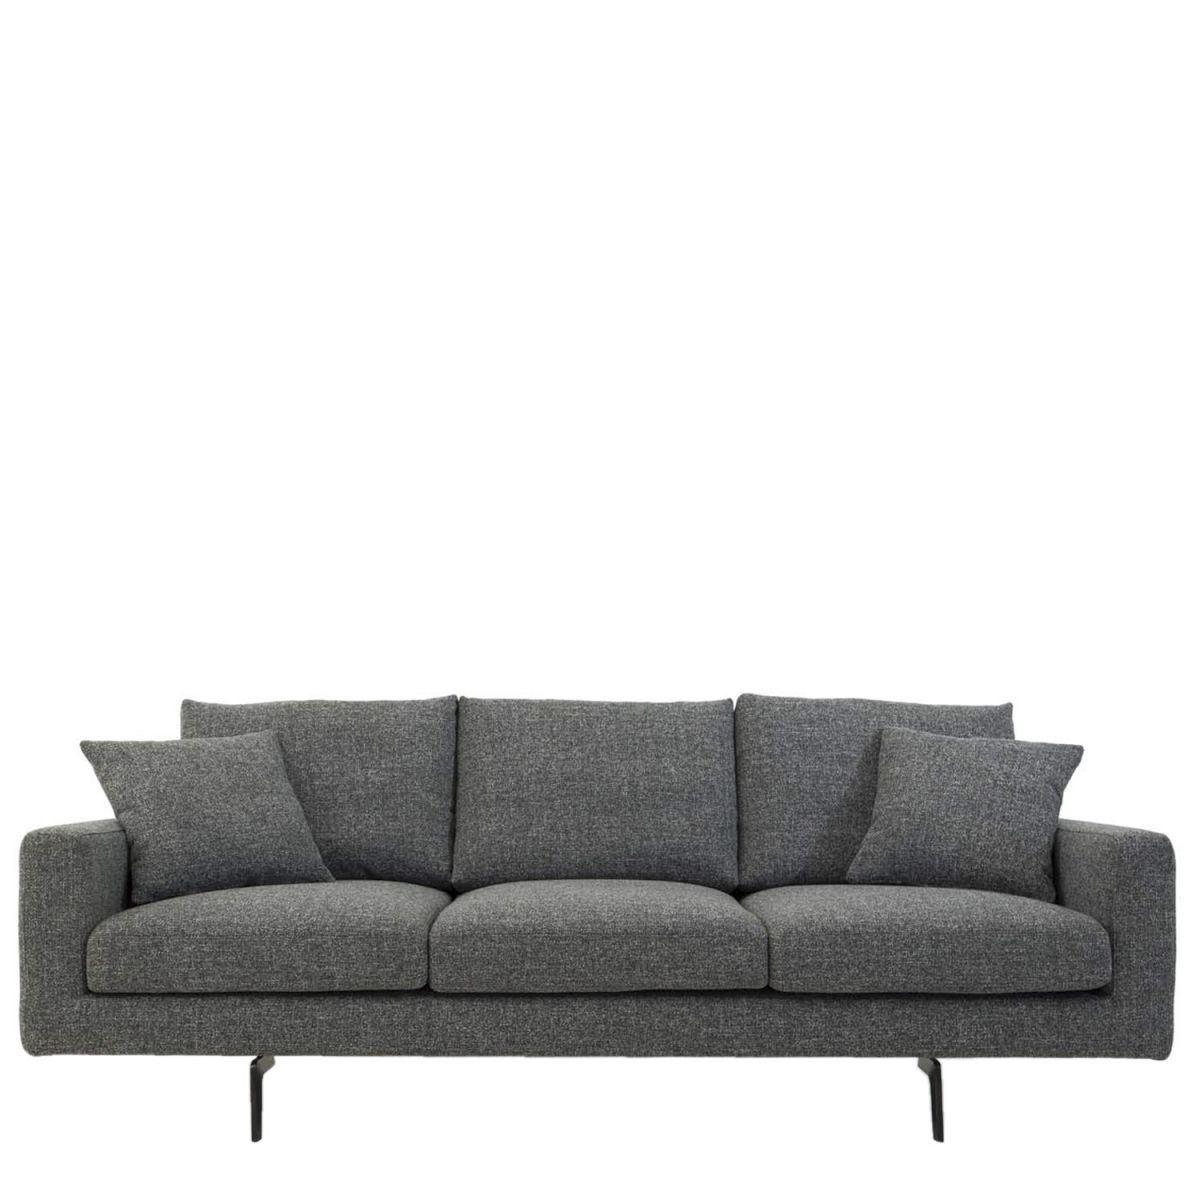 Pia Sofa Living Room Furniture Inspiration Furniture